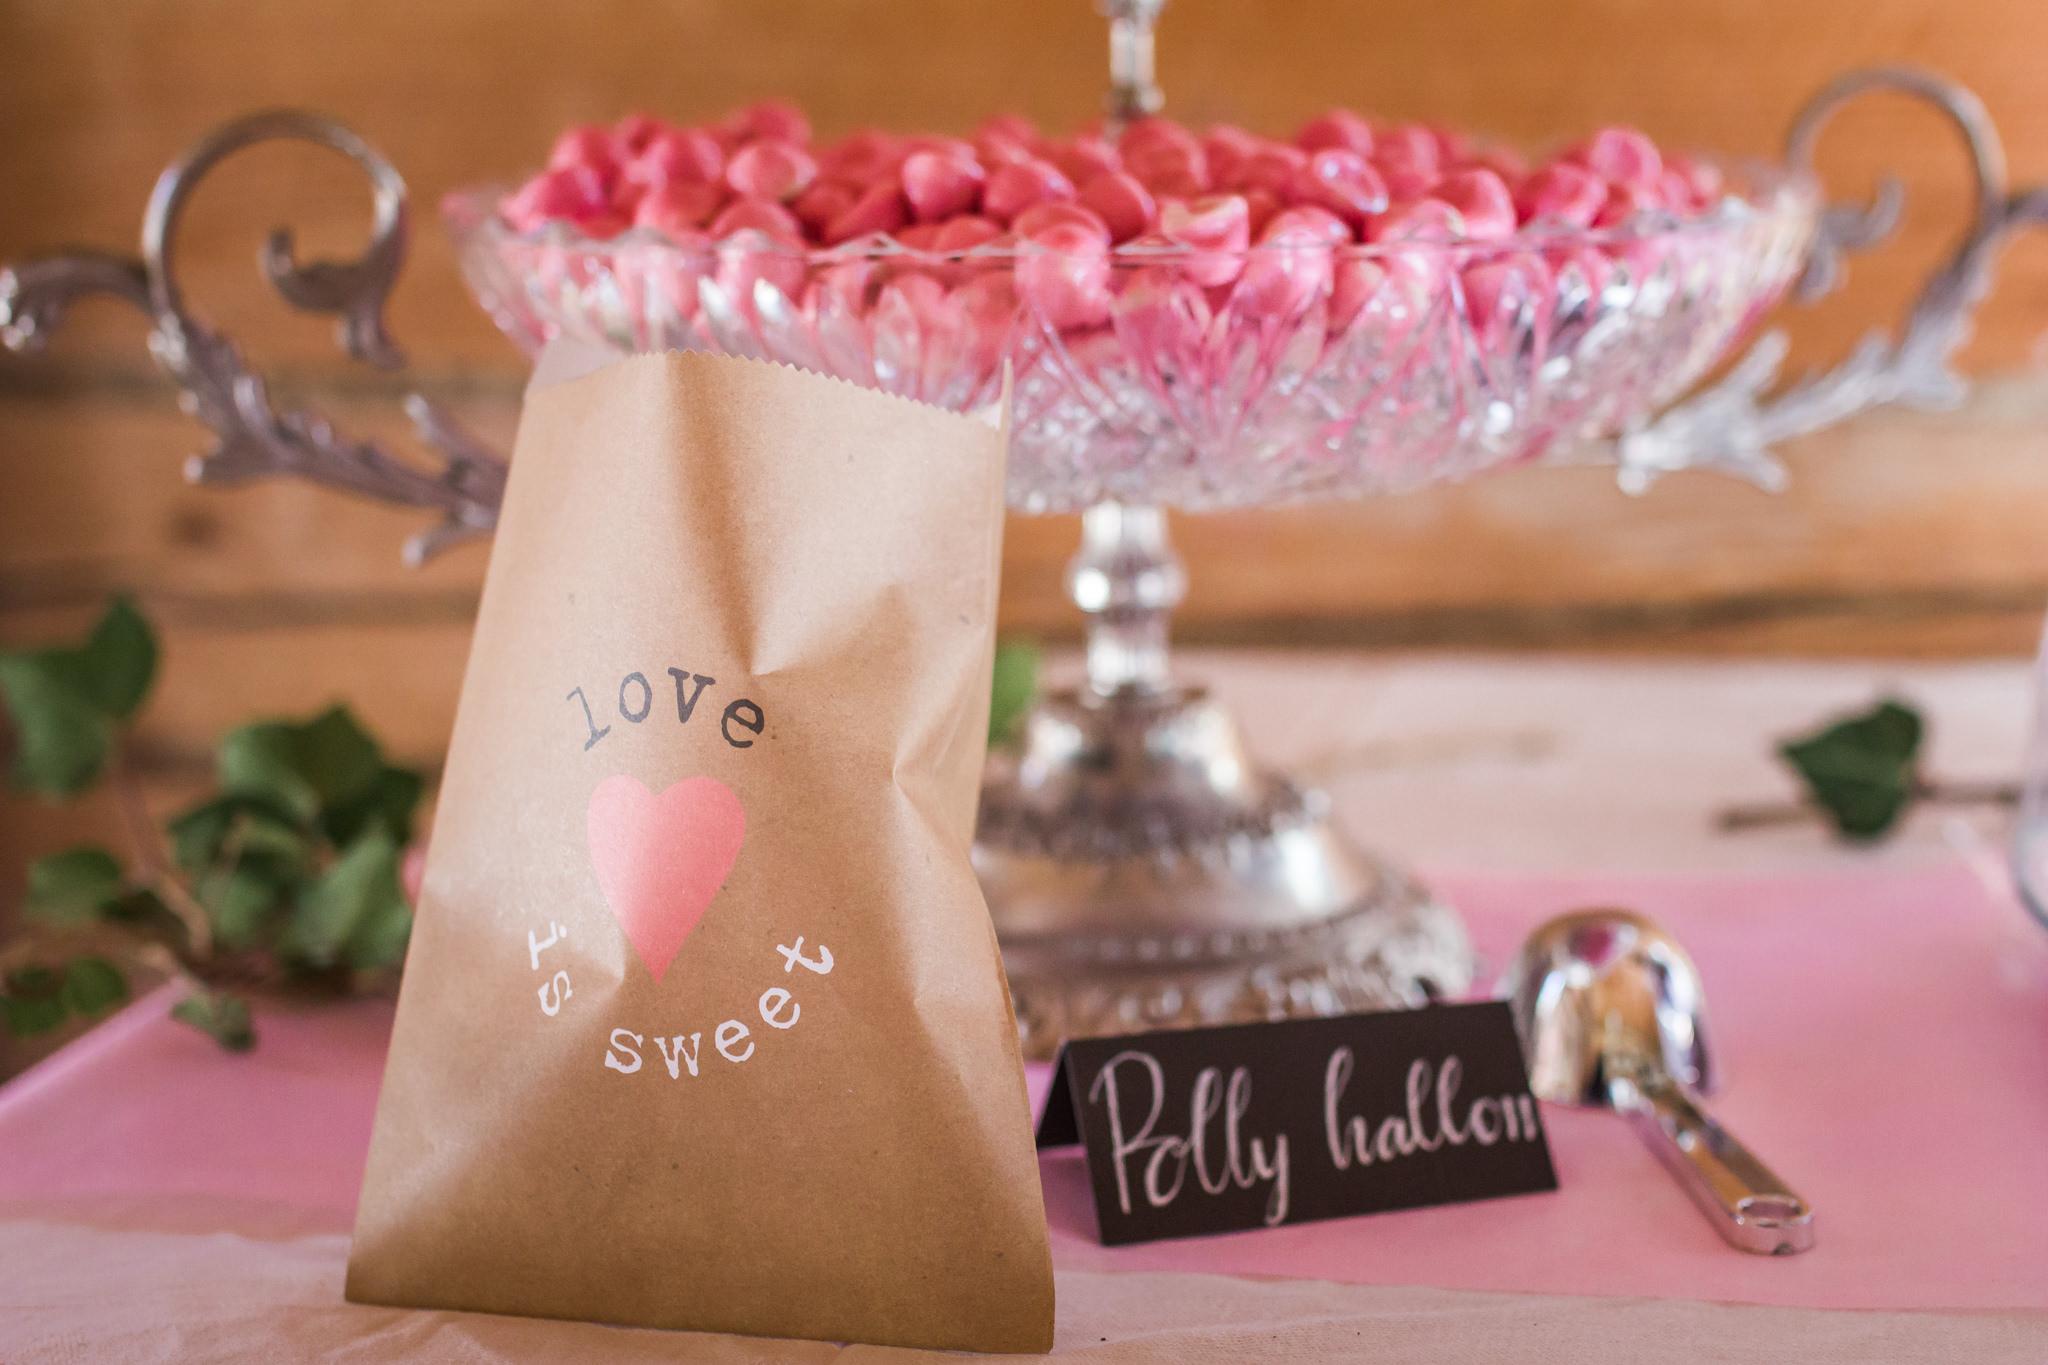 Candybar Polly hallon på bröllop i Slattefors Magasin i Linköping